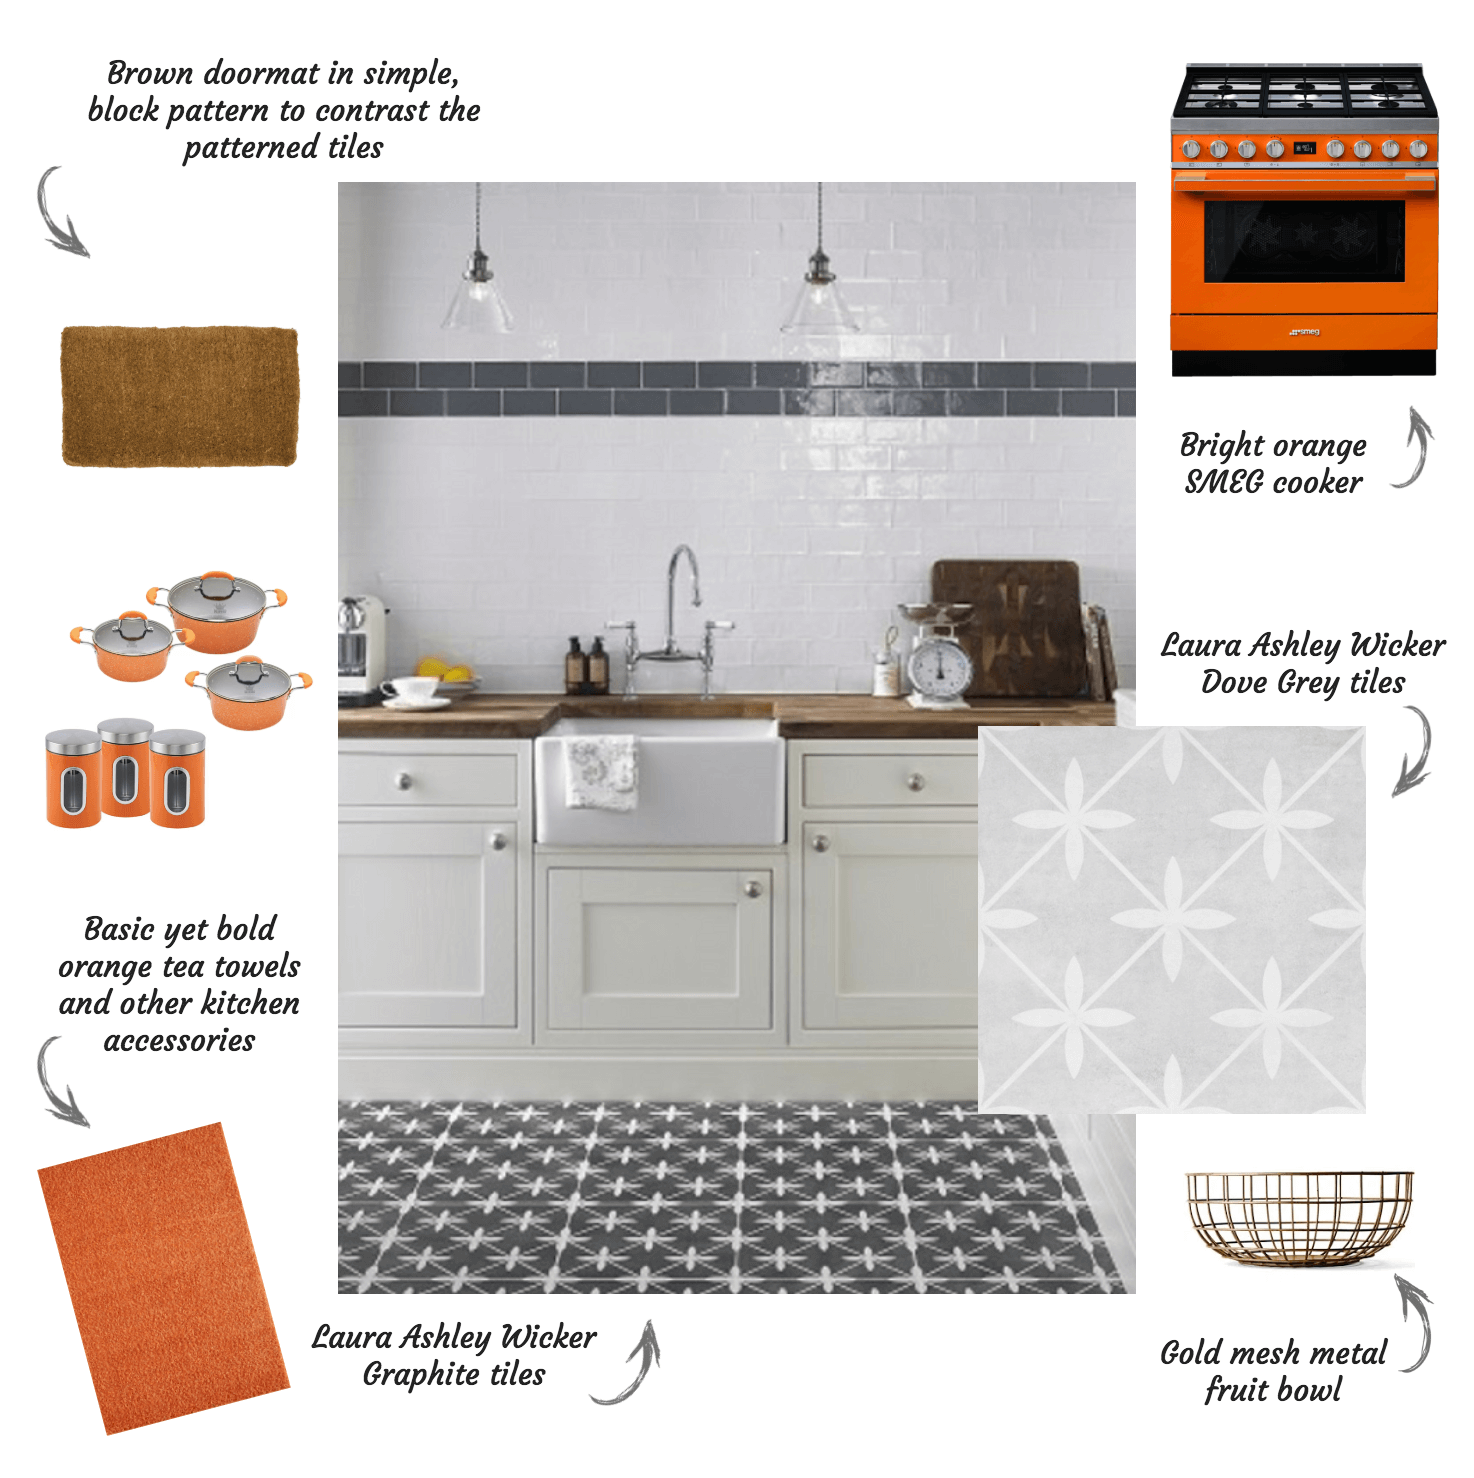 Laura Ashley Wicker Patterned Tiles